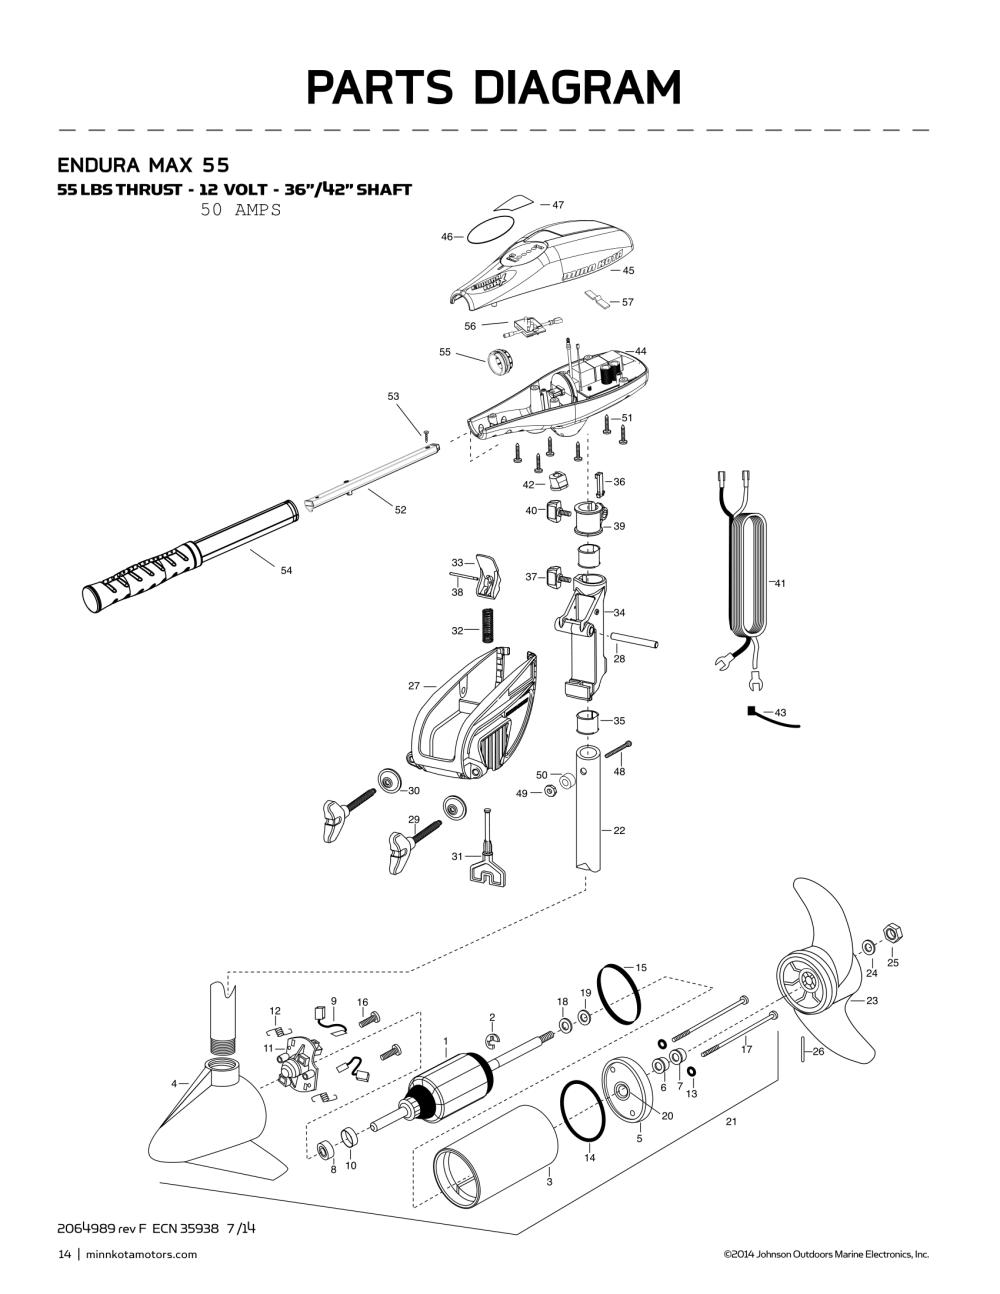 medium resolution of minn kota endura max 55 parts 2015 from fish307 com2015 mk enduramax55 1 png